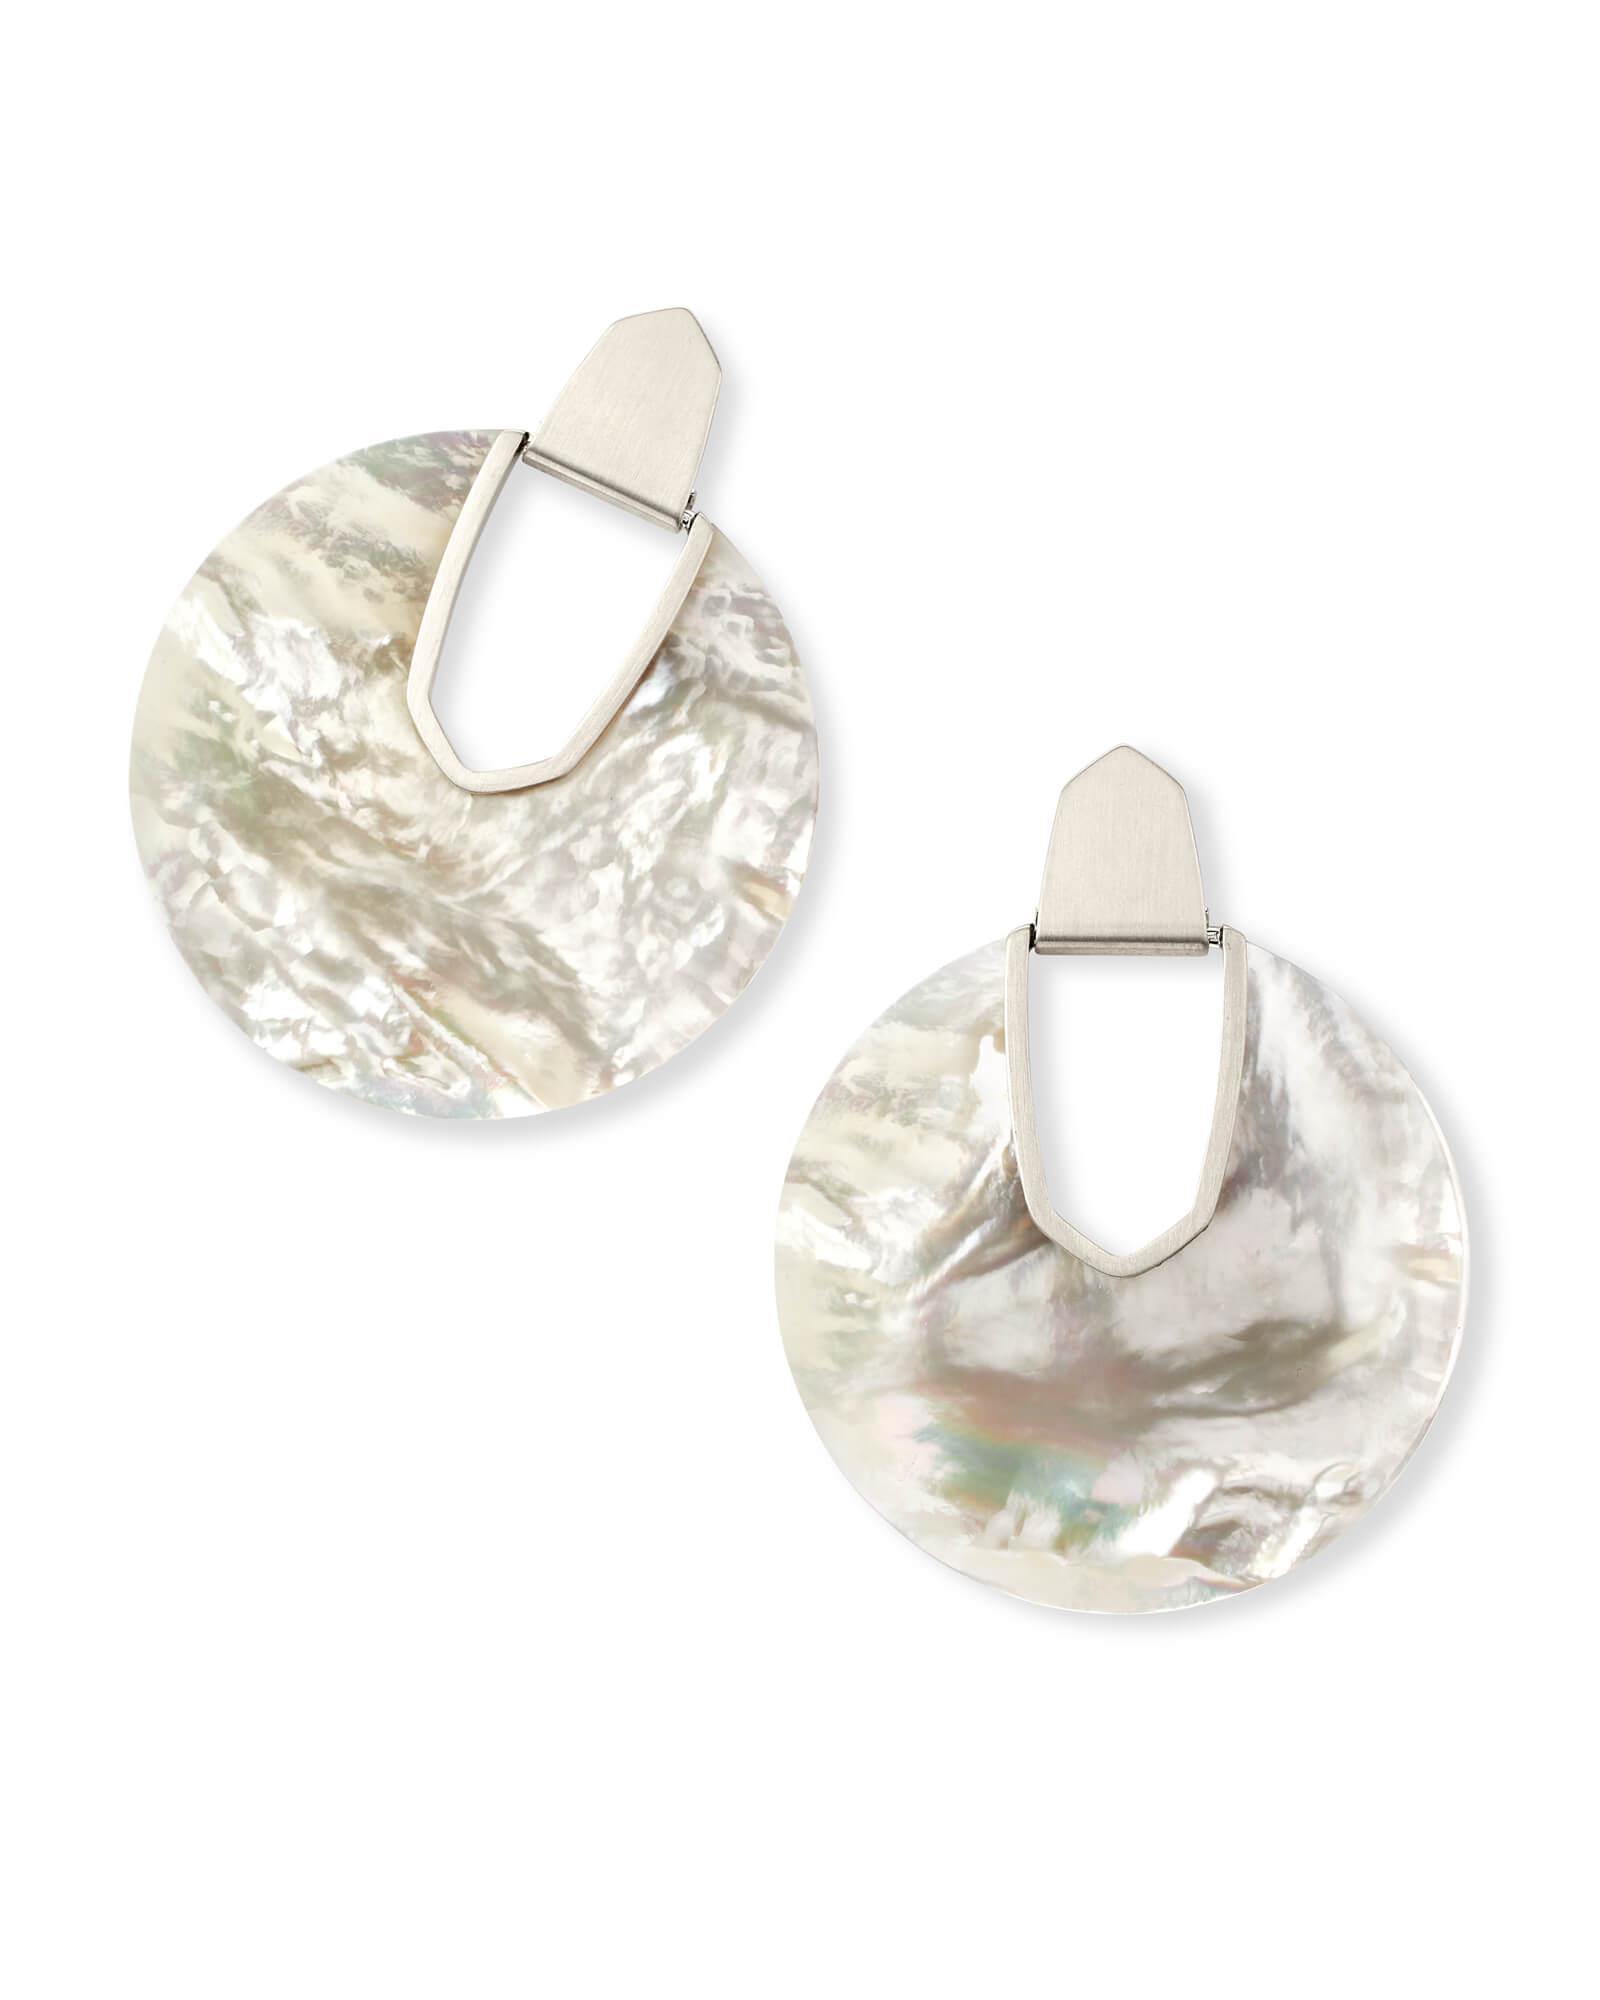 11ac2f2359ae4 Kendra Scott Metallic Diane Silver Statement Earrings In Ivory Mother Of  Pearl